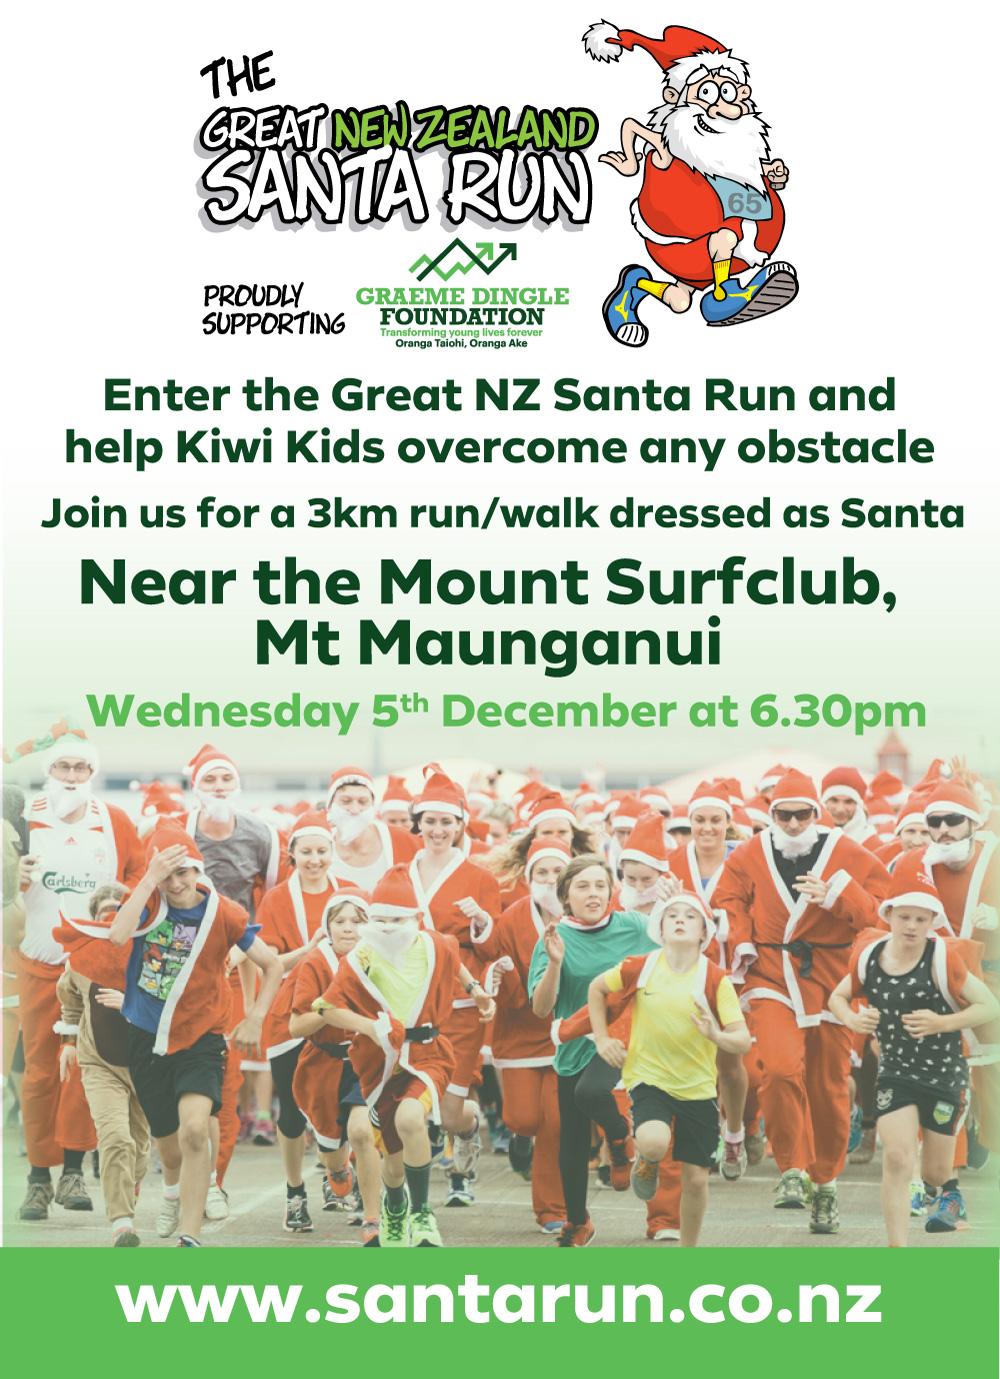 The Great NZ Santa Run